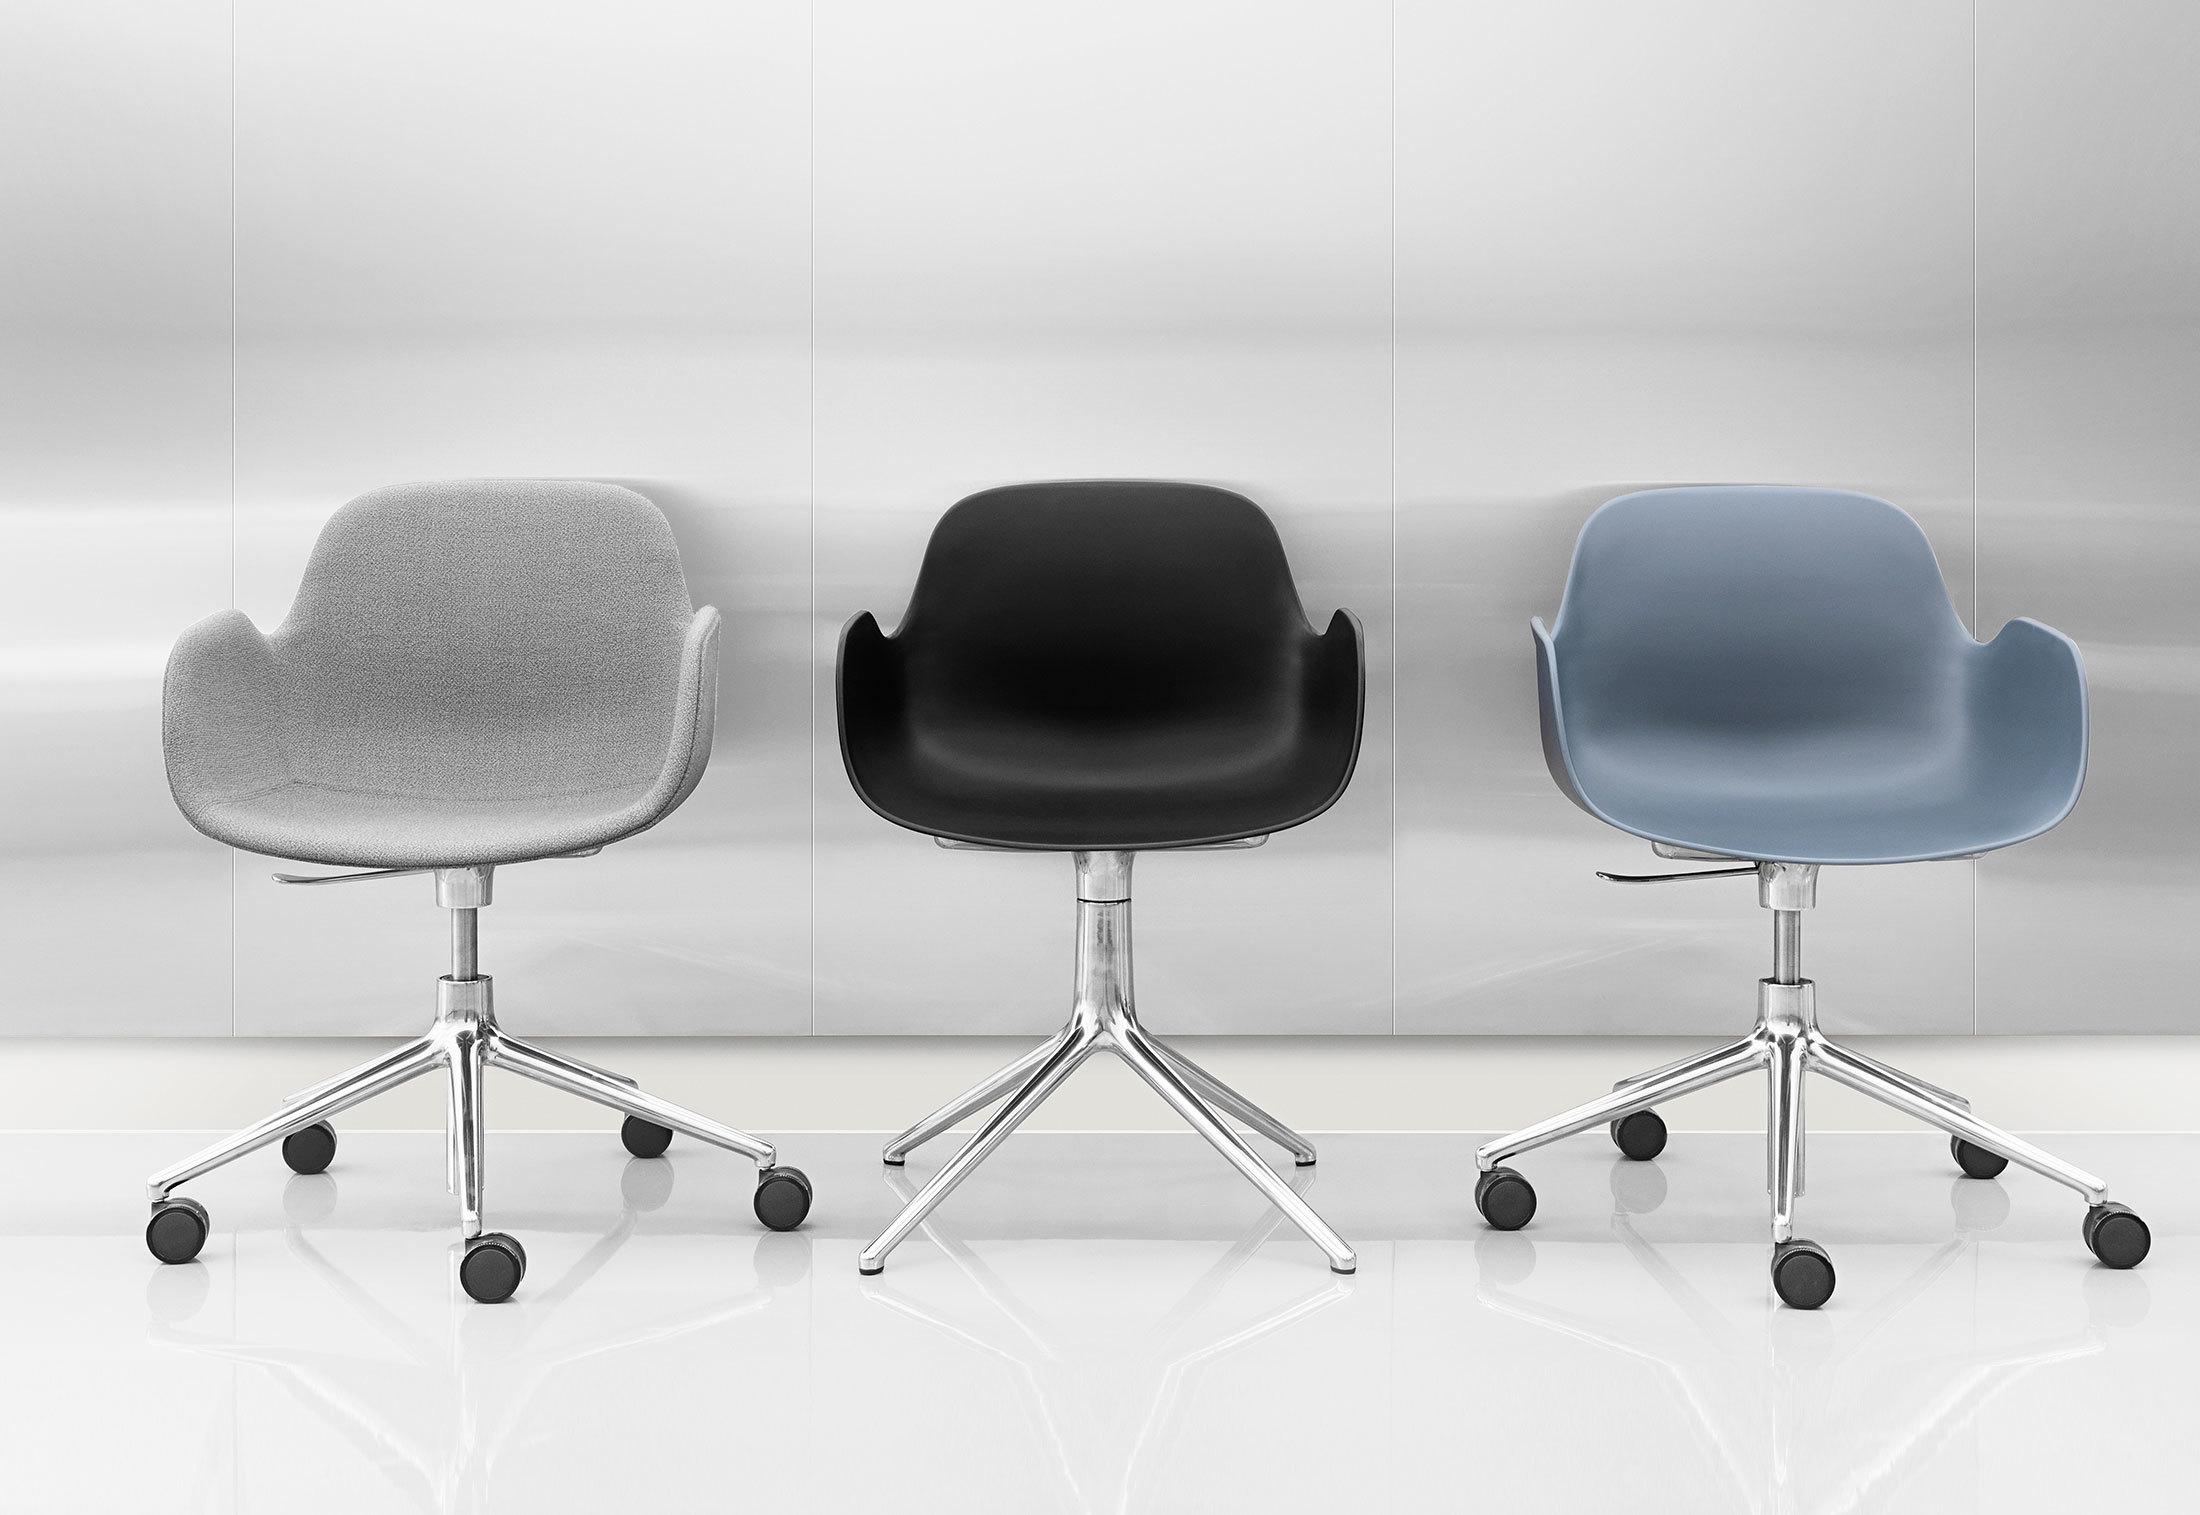 Astonishing Form Swivel Chair By Normann Copenhagen Stylepark Creativecarmelina Interior Chair Design Creativecarmelinacom